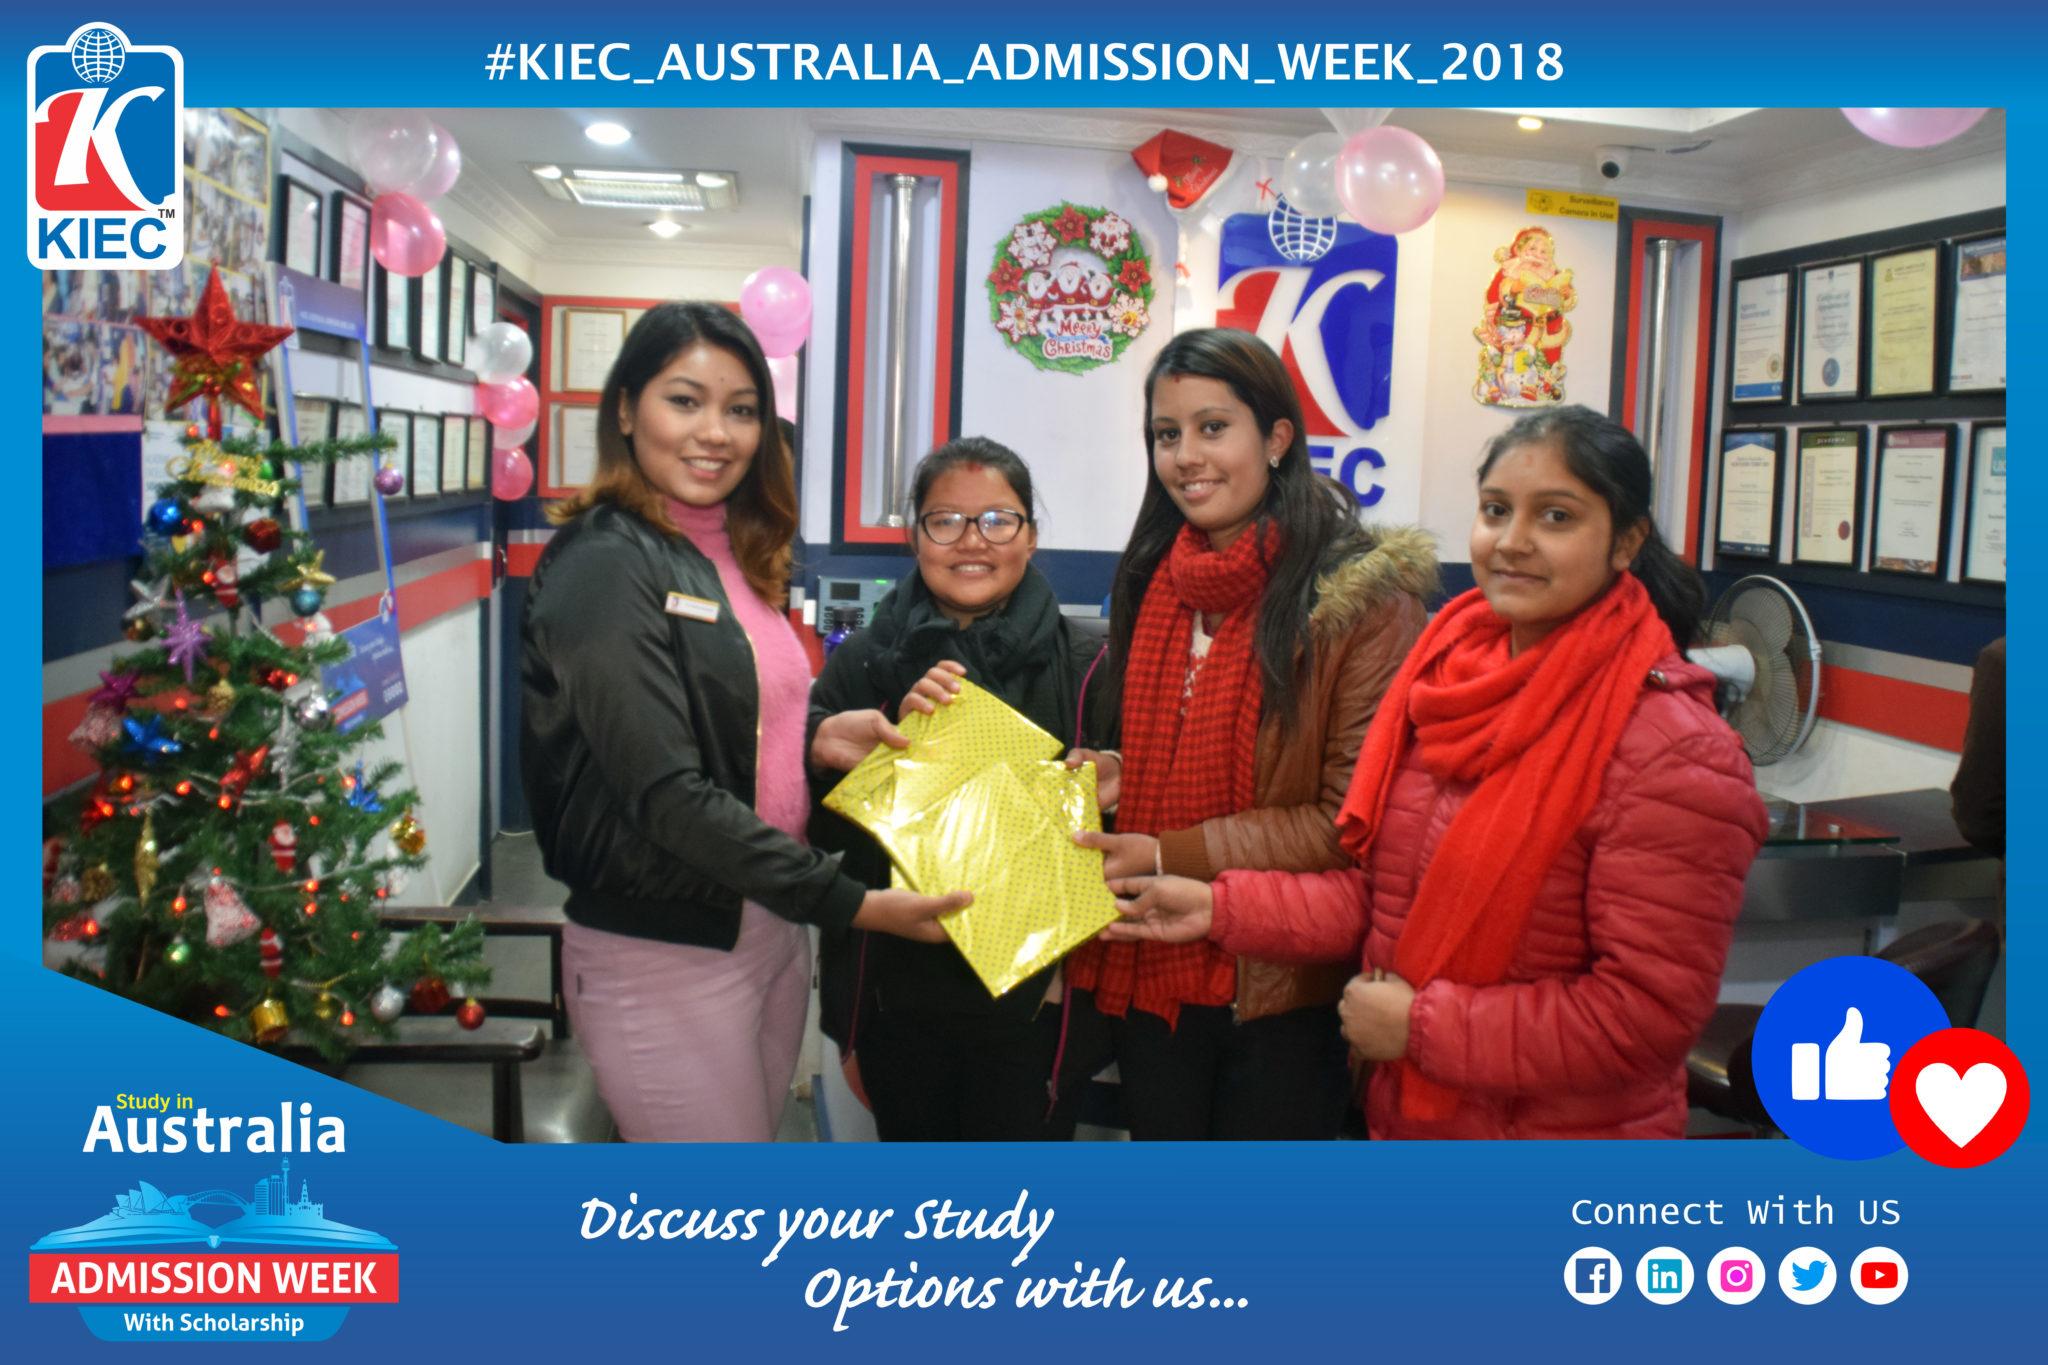 KIEC Counsellor Shyam Dahal with Visitors